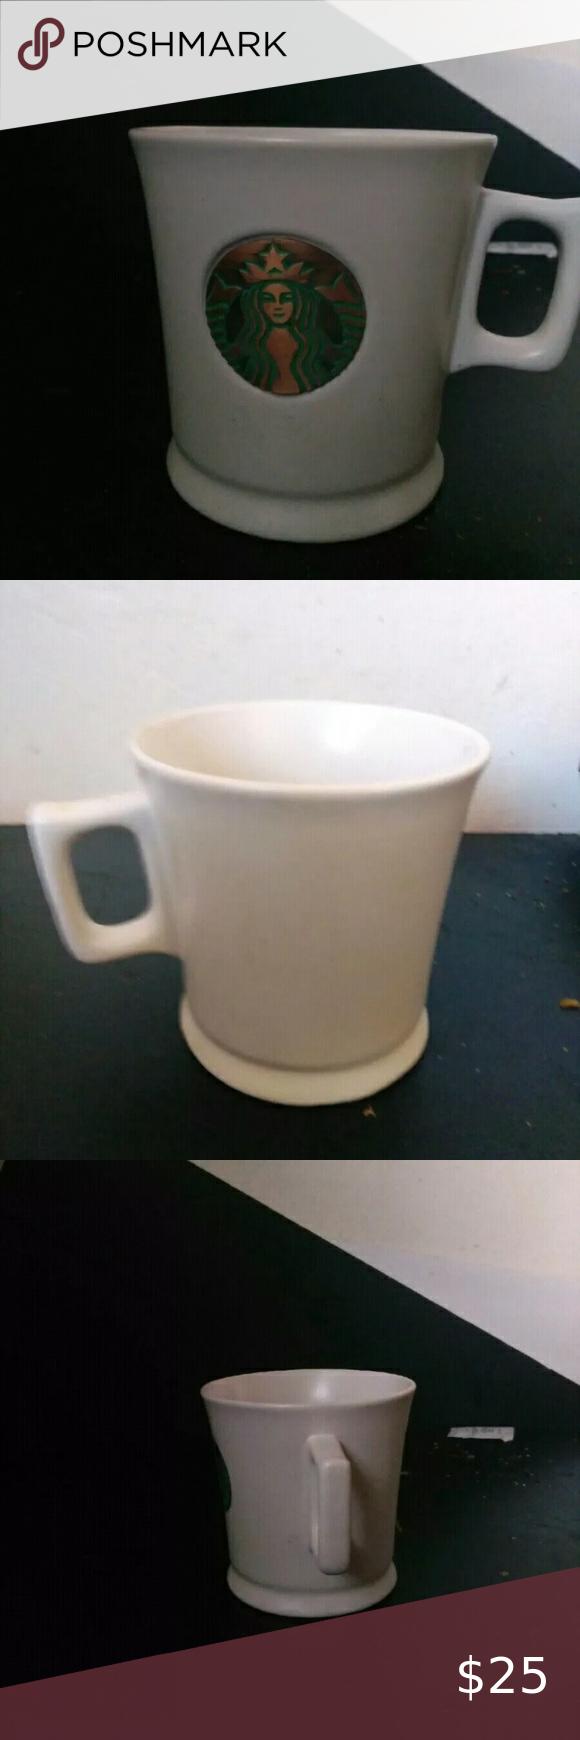 Starbucks ceramic coffee cup mug white 2014 in 2020